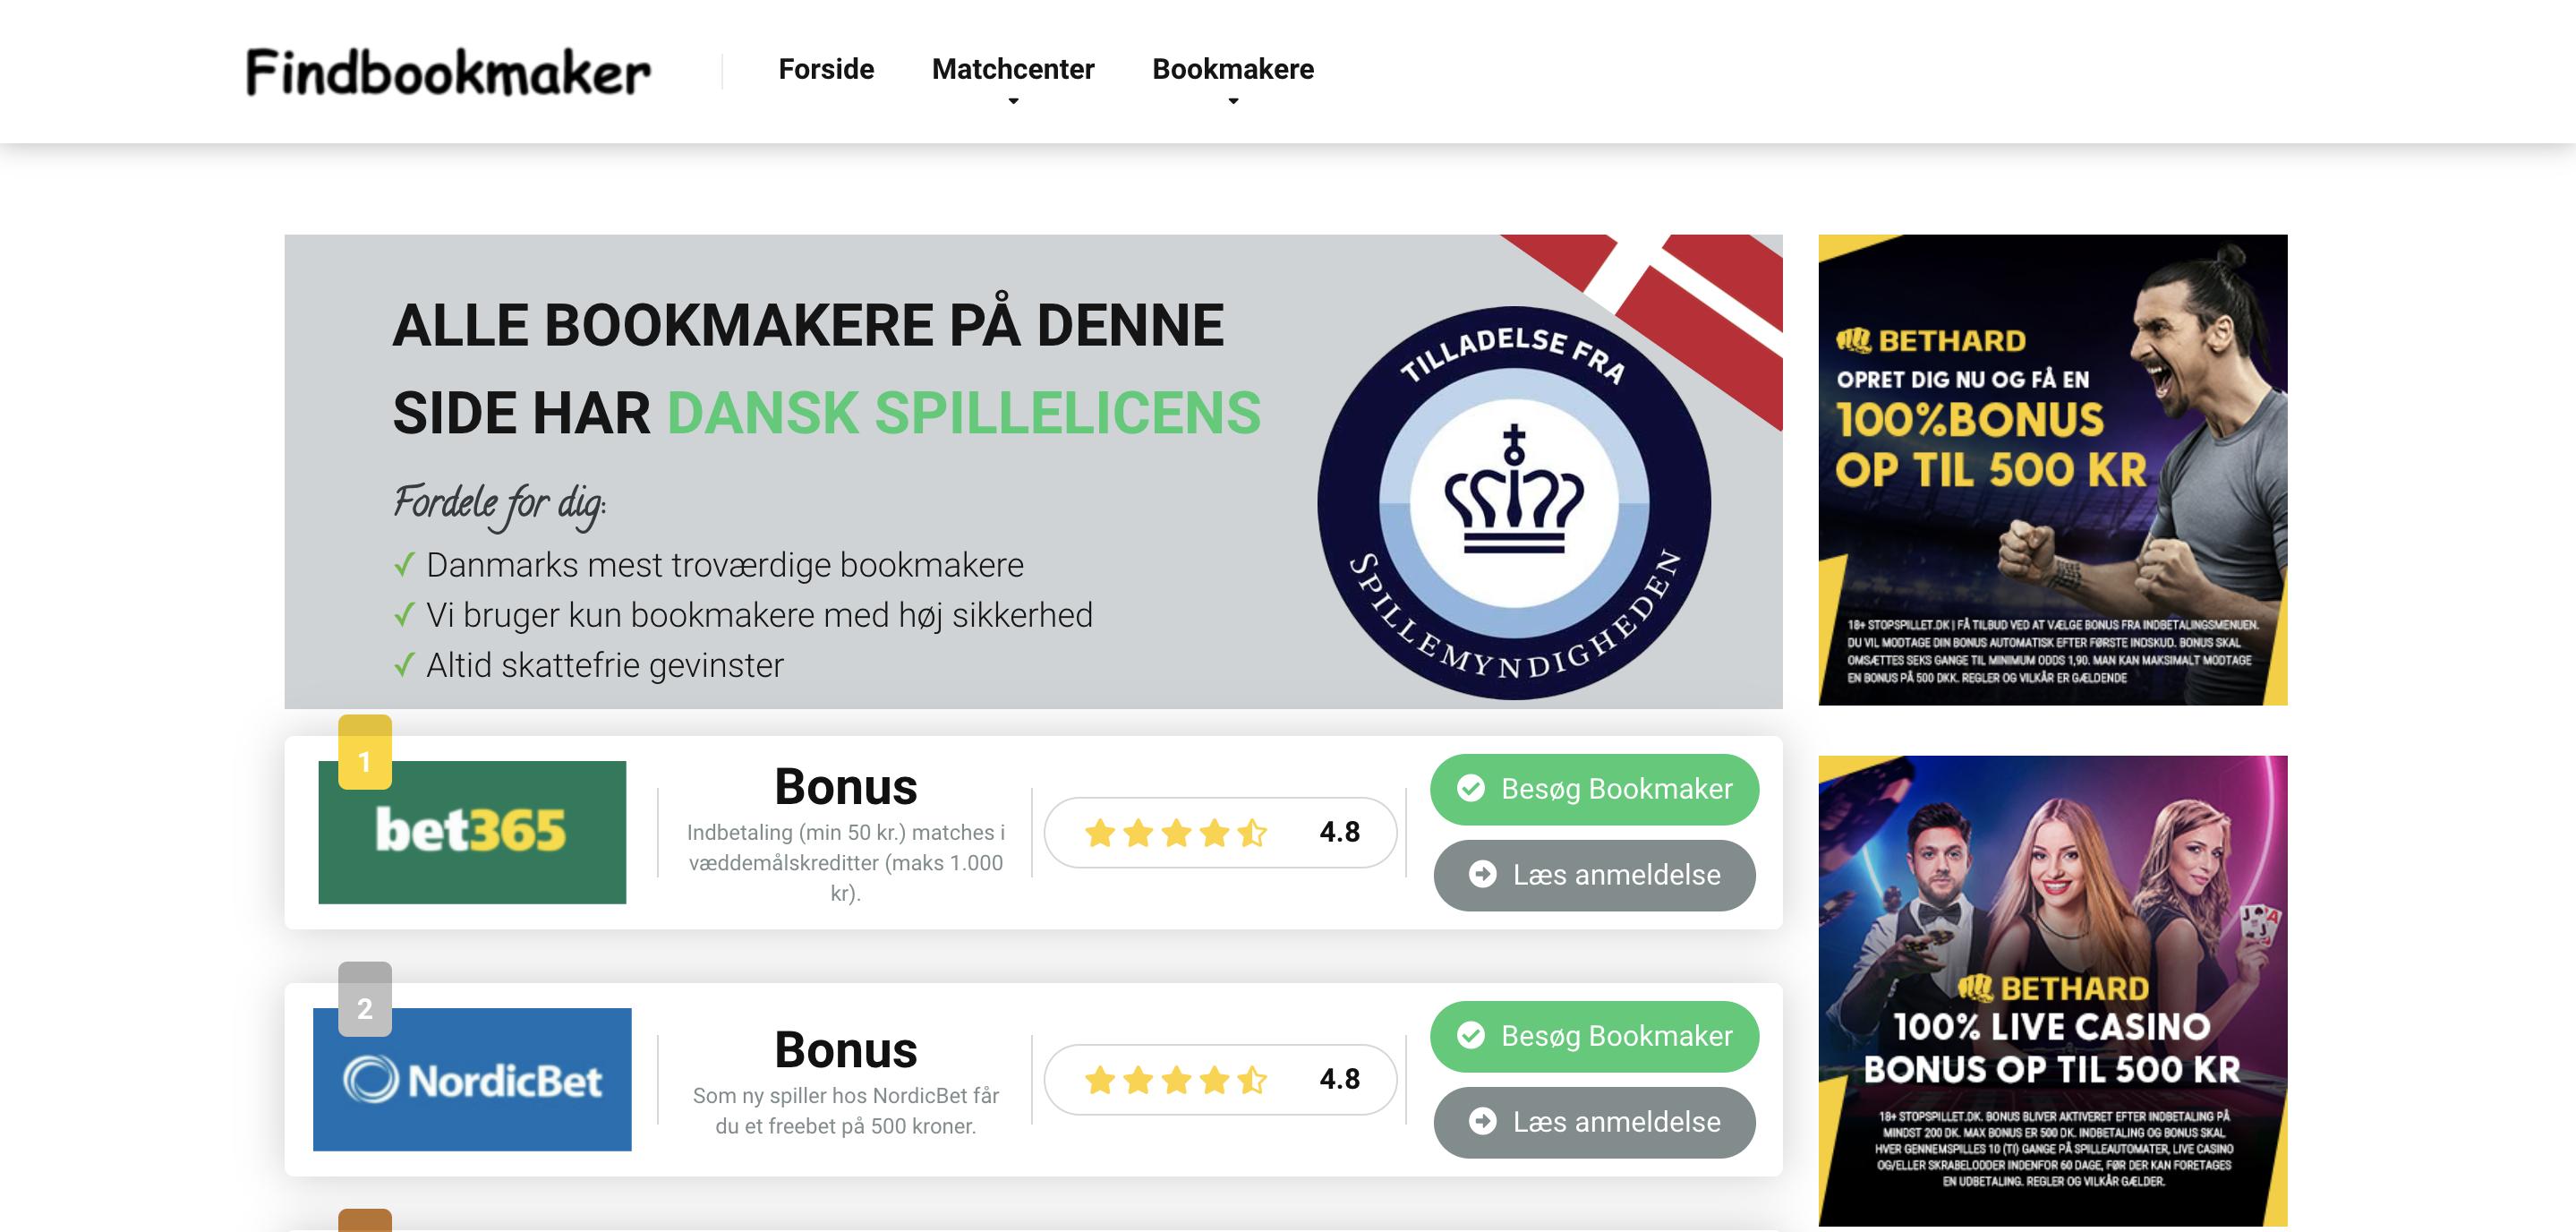 Findbookmaker.dk